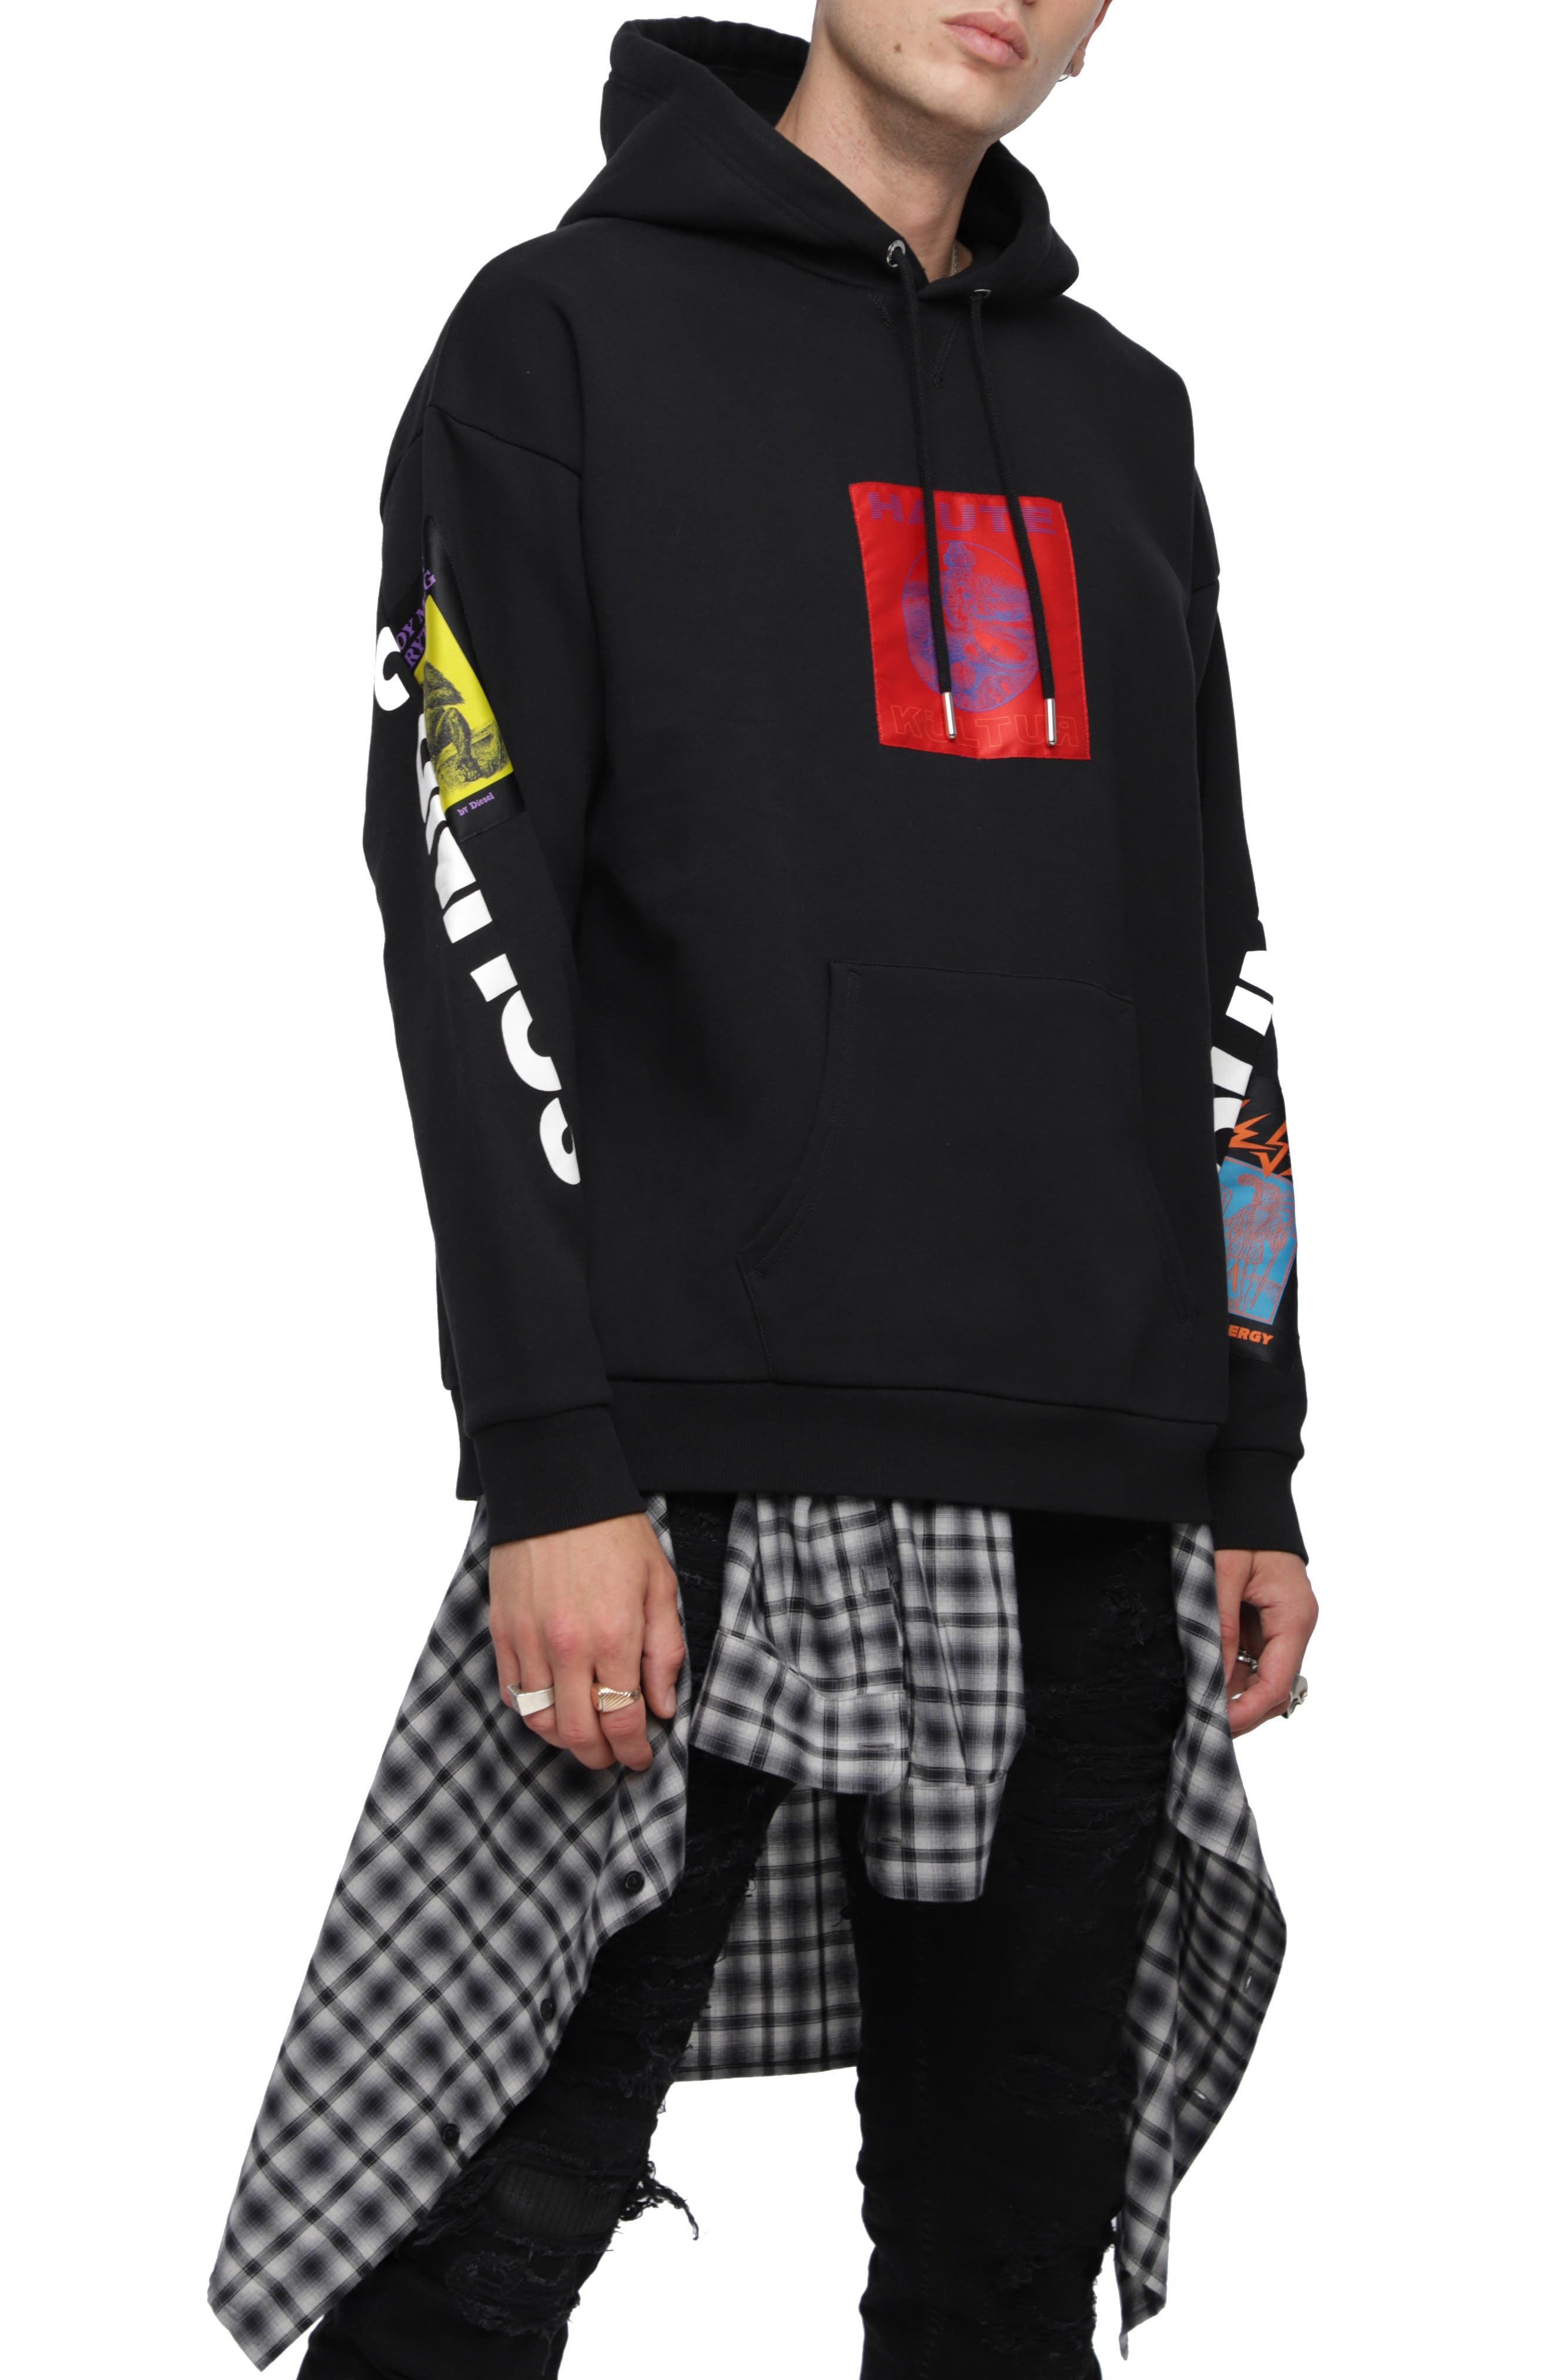 S-JACK-XA Hoodie Sweatshirt,                         Main,                         color, 001